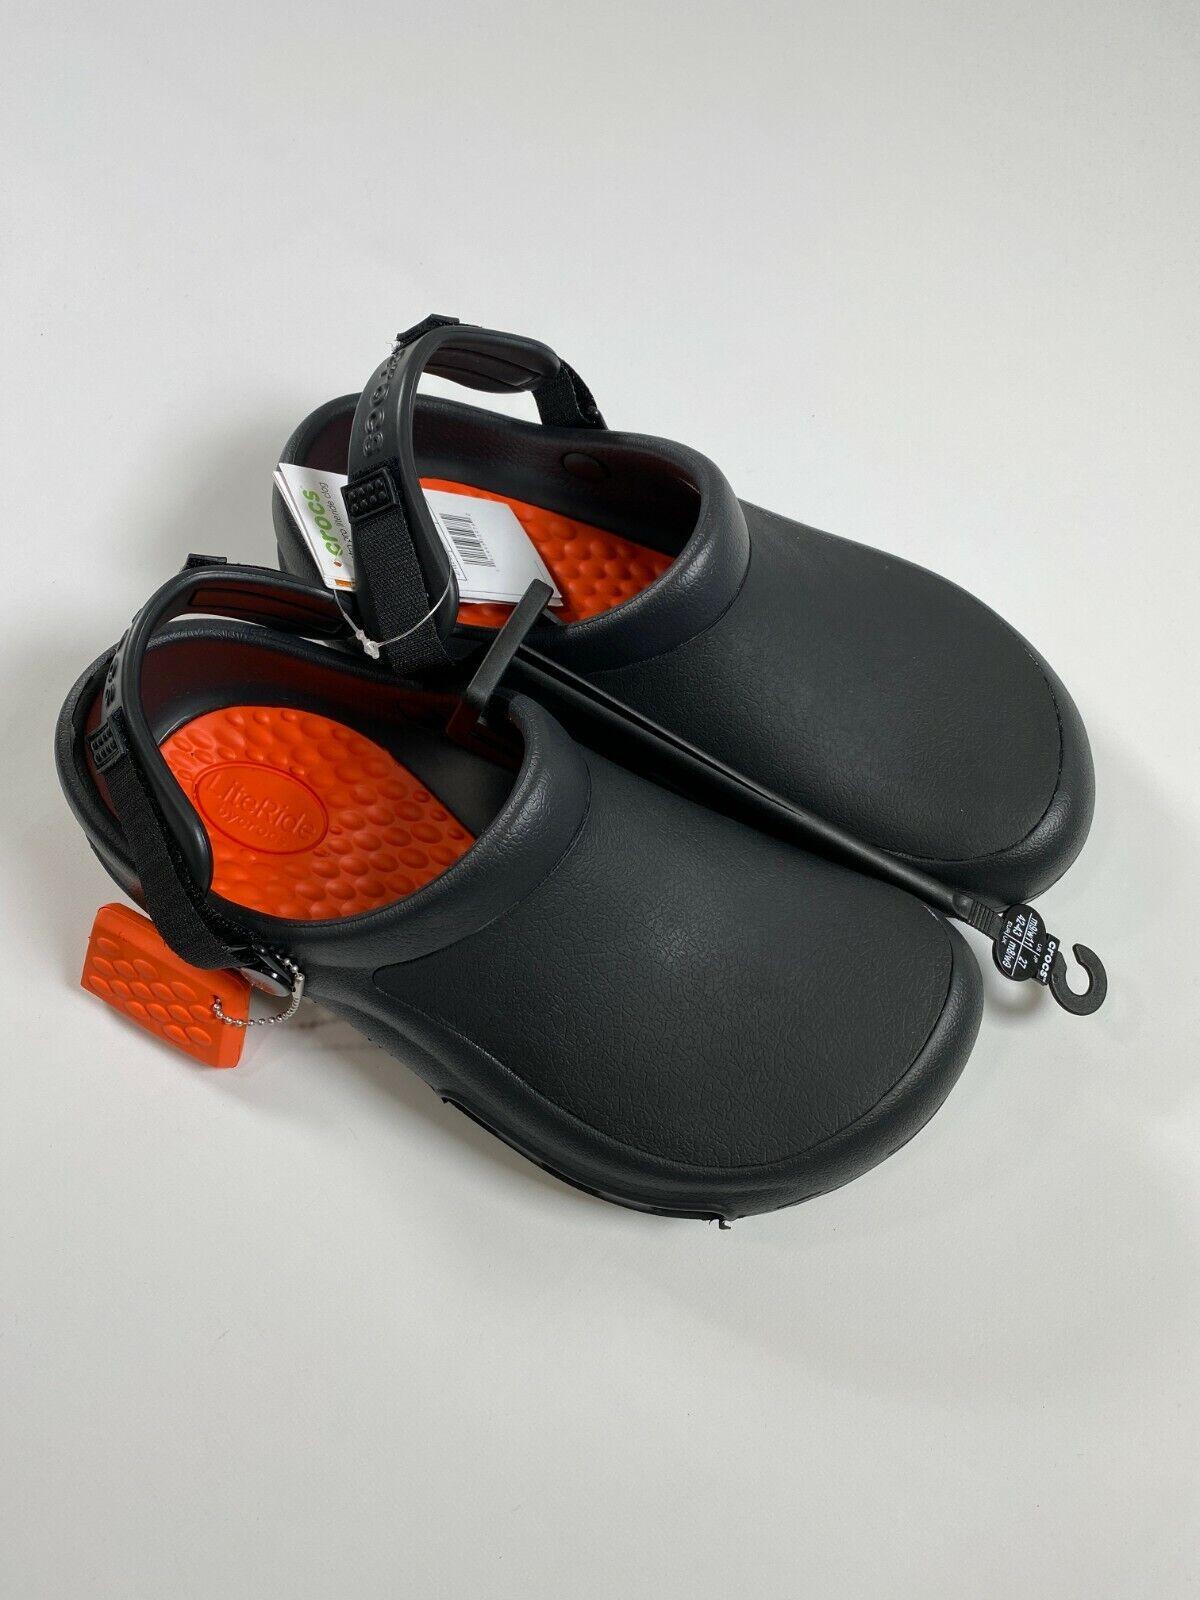 Crocs Unisex Black Roomy Fit Bistro Pro Literide Clog NEW! N